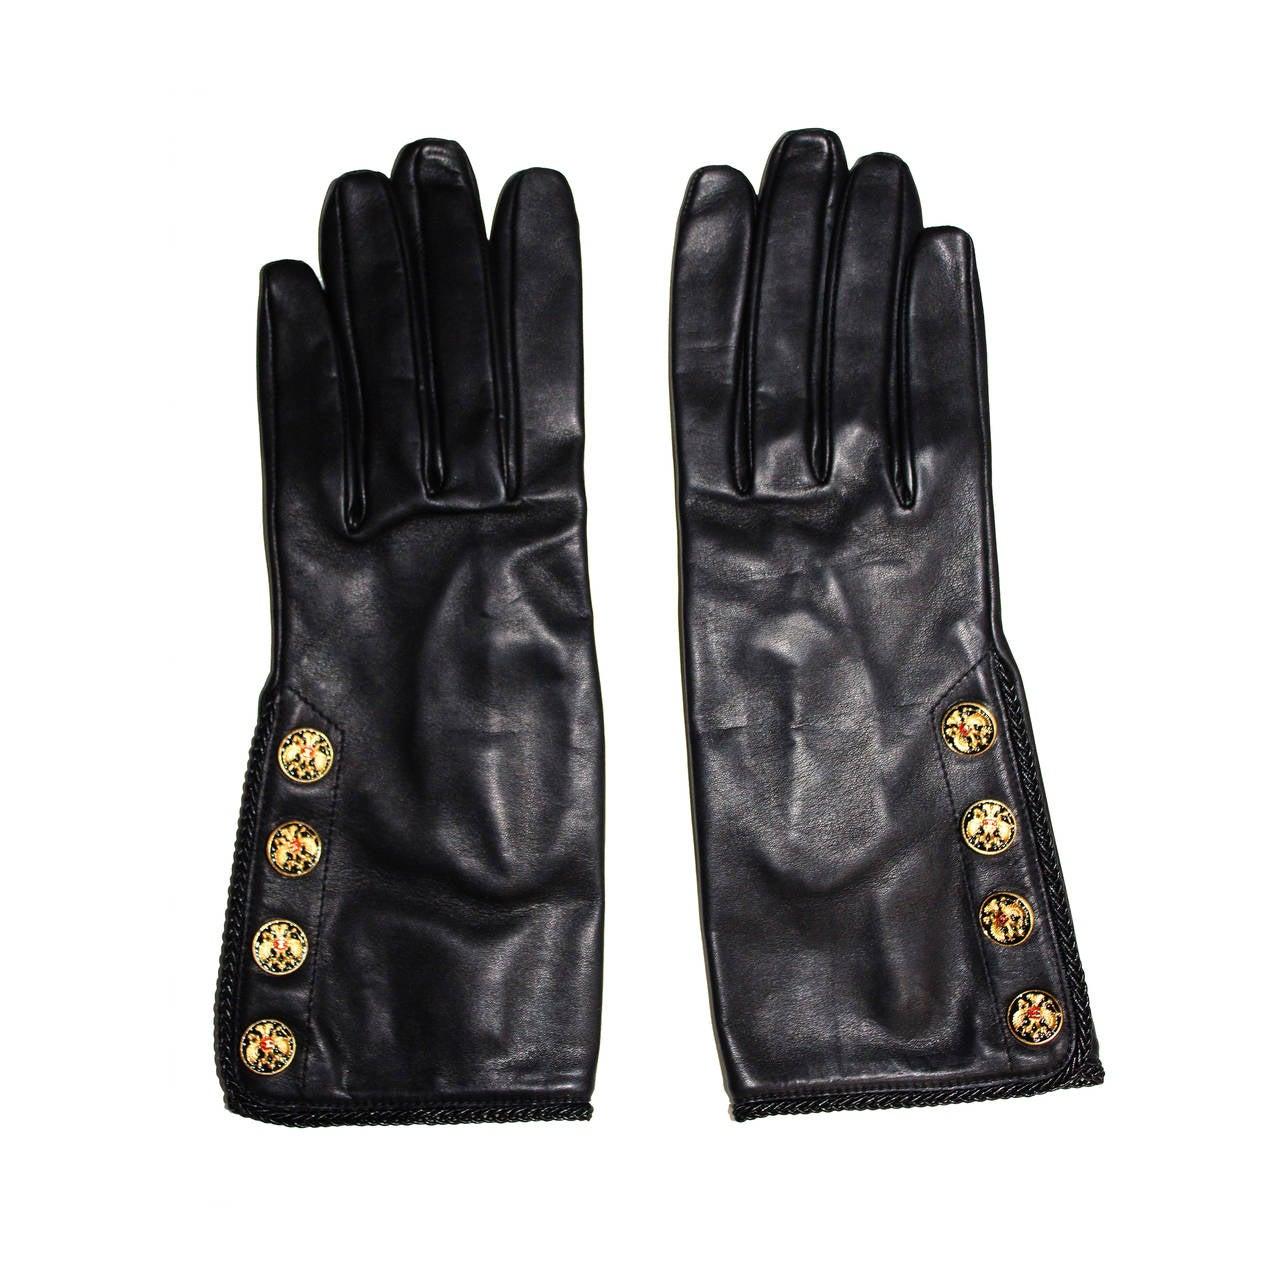 Chanel New/Unworn Lambskin Leather Gloves at 1stdibs